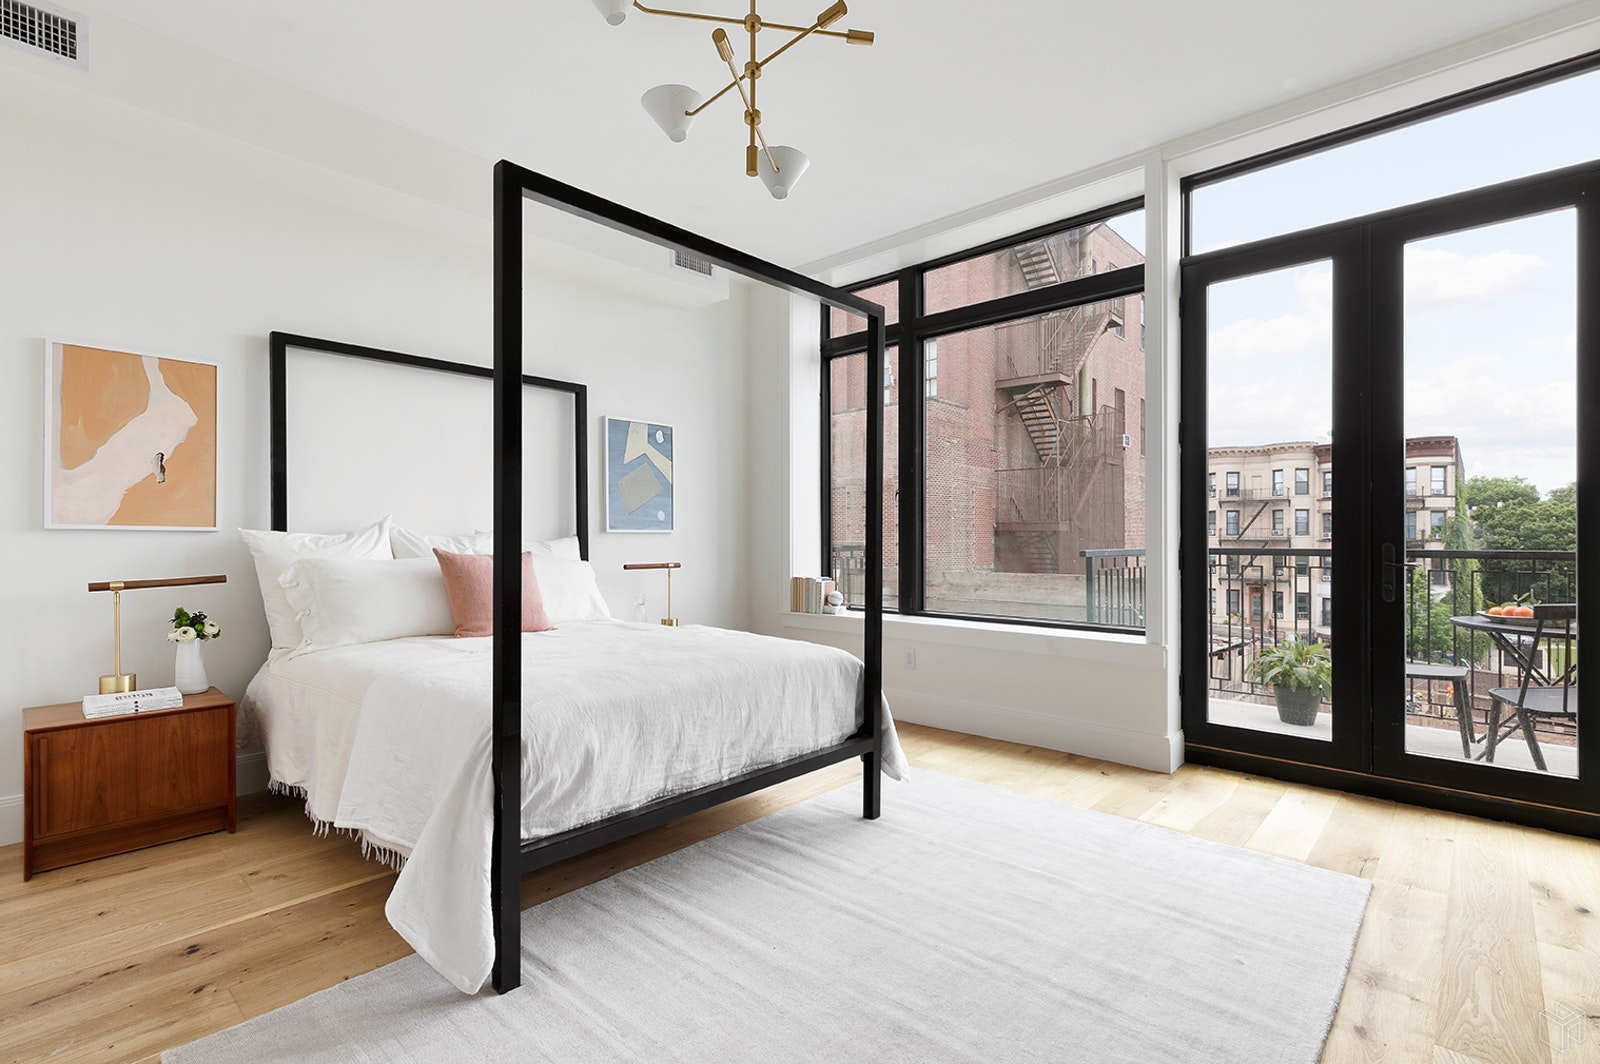 346 B 13TH STREET, Park Slope, $3,800,000, Web #: 17402408